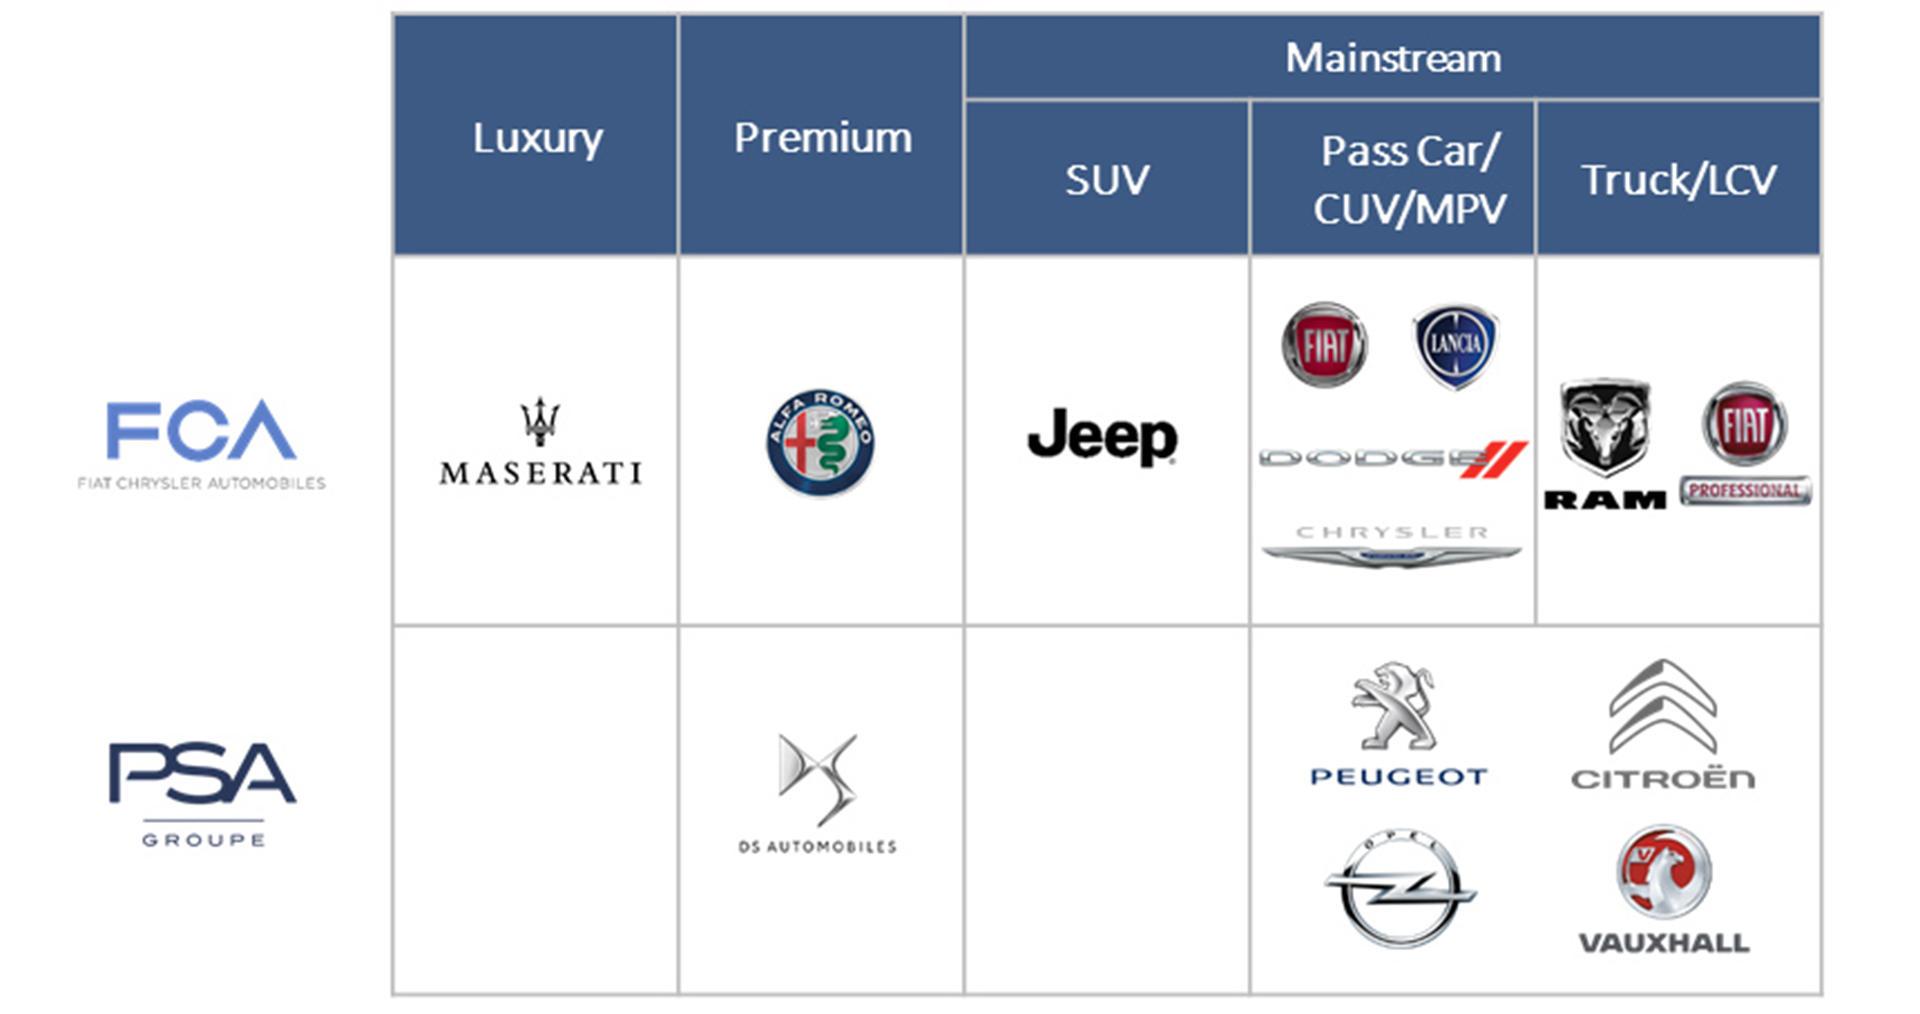 Fiat Chrysler Automobiles и PSA Group подписали соглашение о слиянии